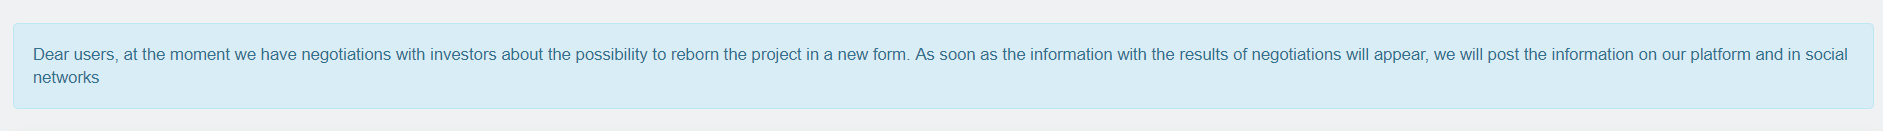 GetBTC Message